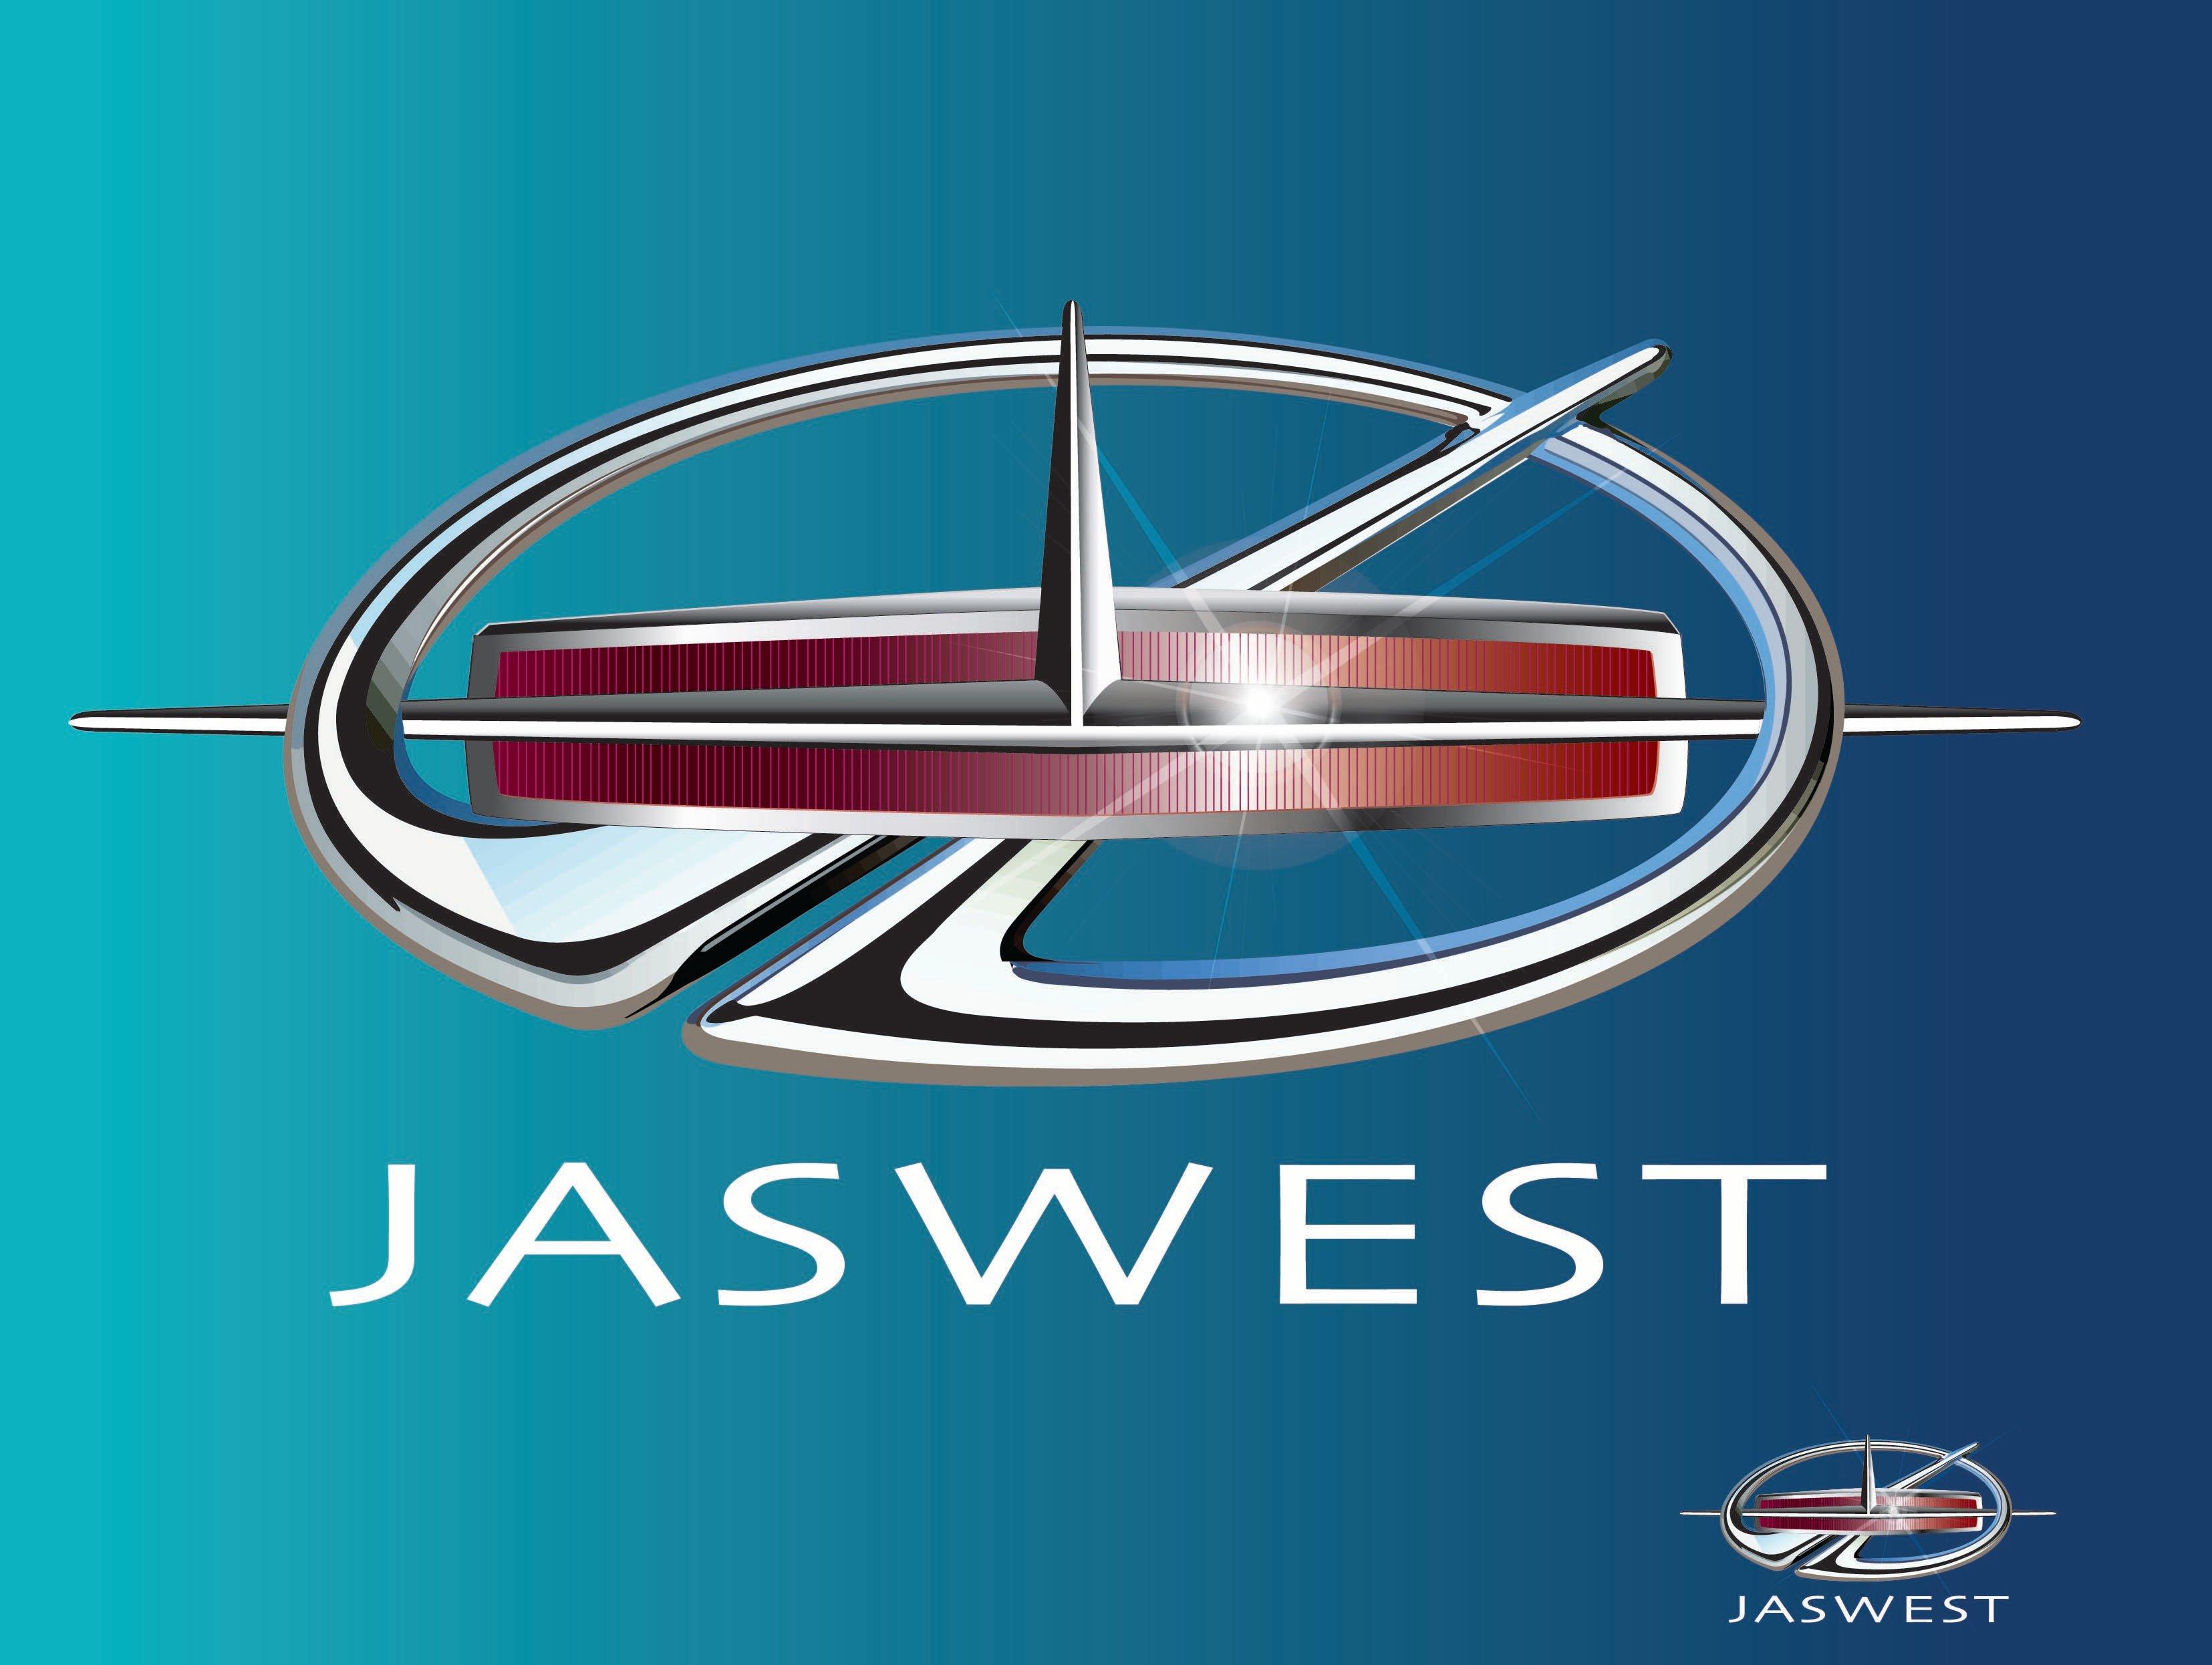 JASWEST